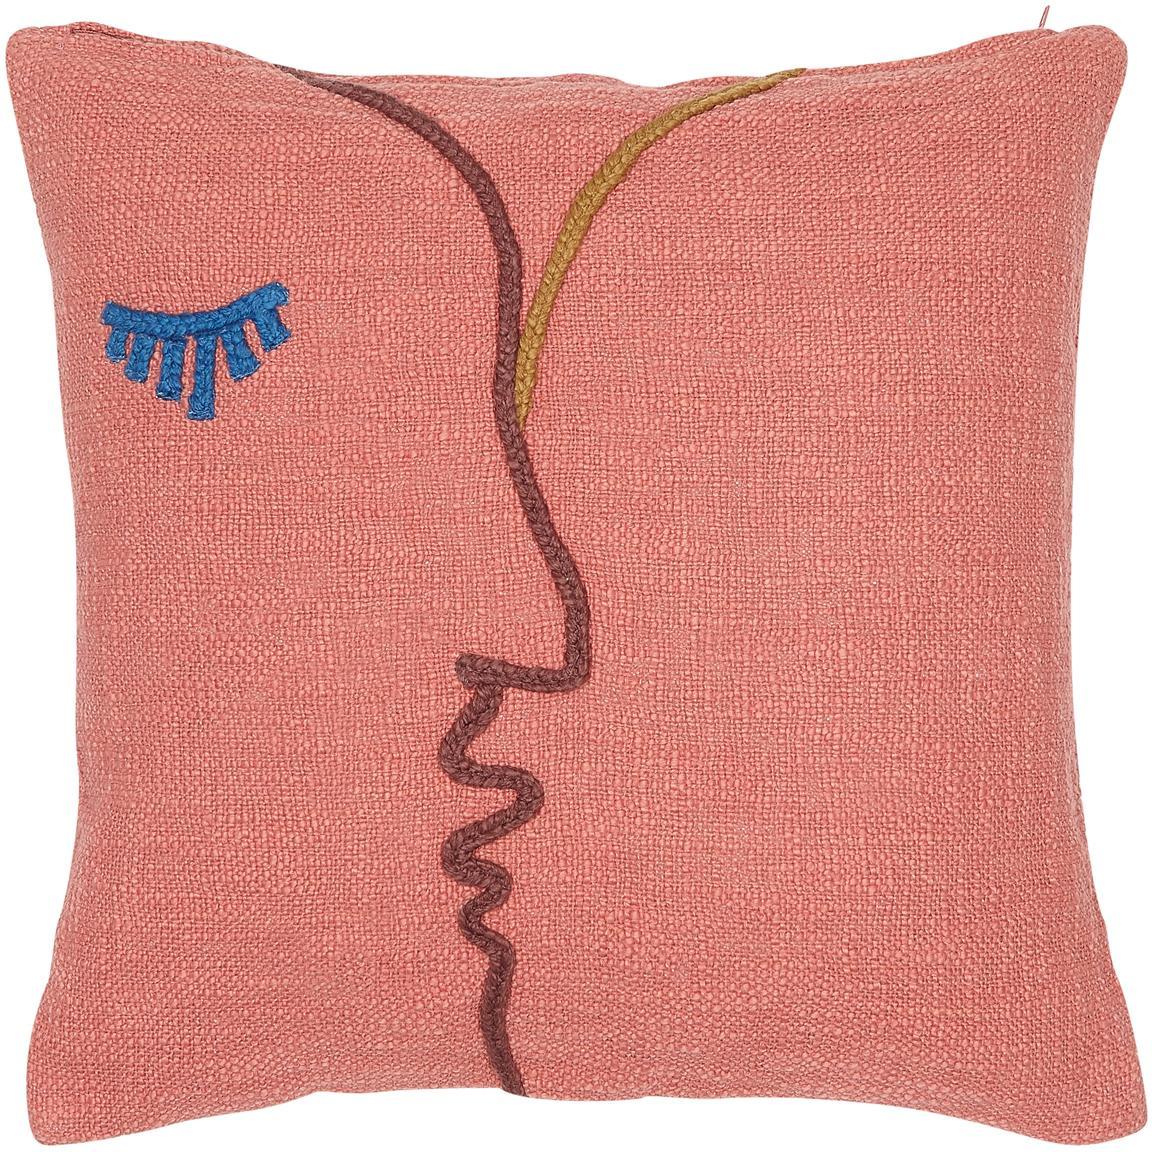 Funda de cojín bordada de algodón ecológico Faces, 100%algodón ecológico, Rojo coral, rojo oscuro, azul, mostaza, An 45 x L 45 cm